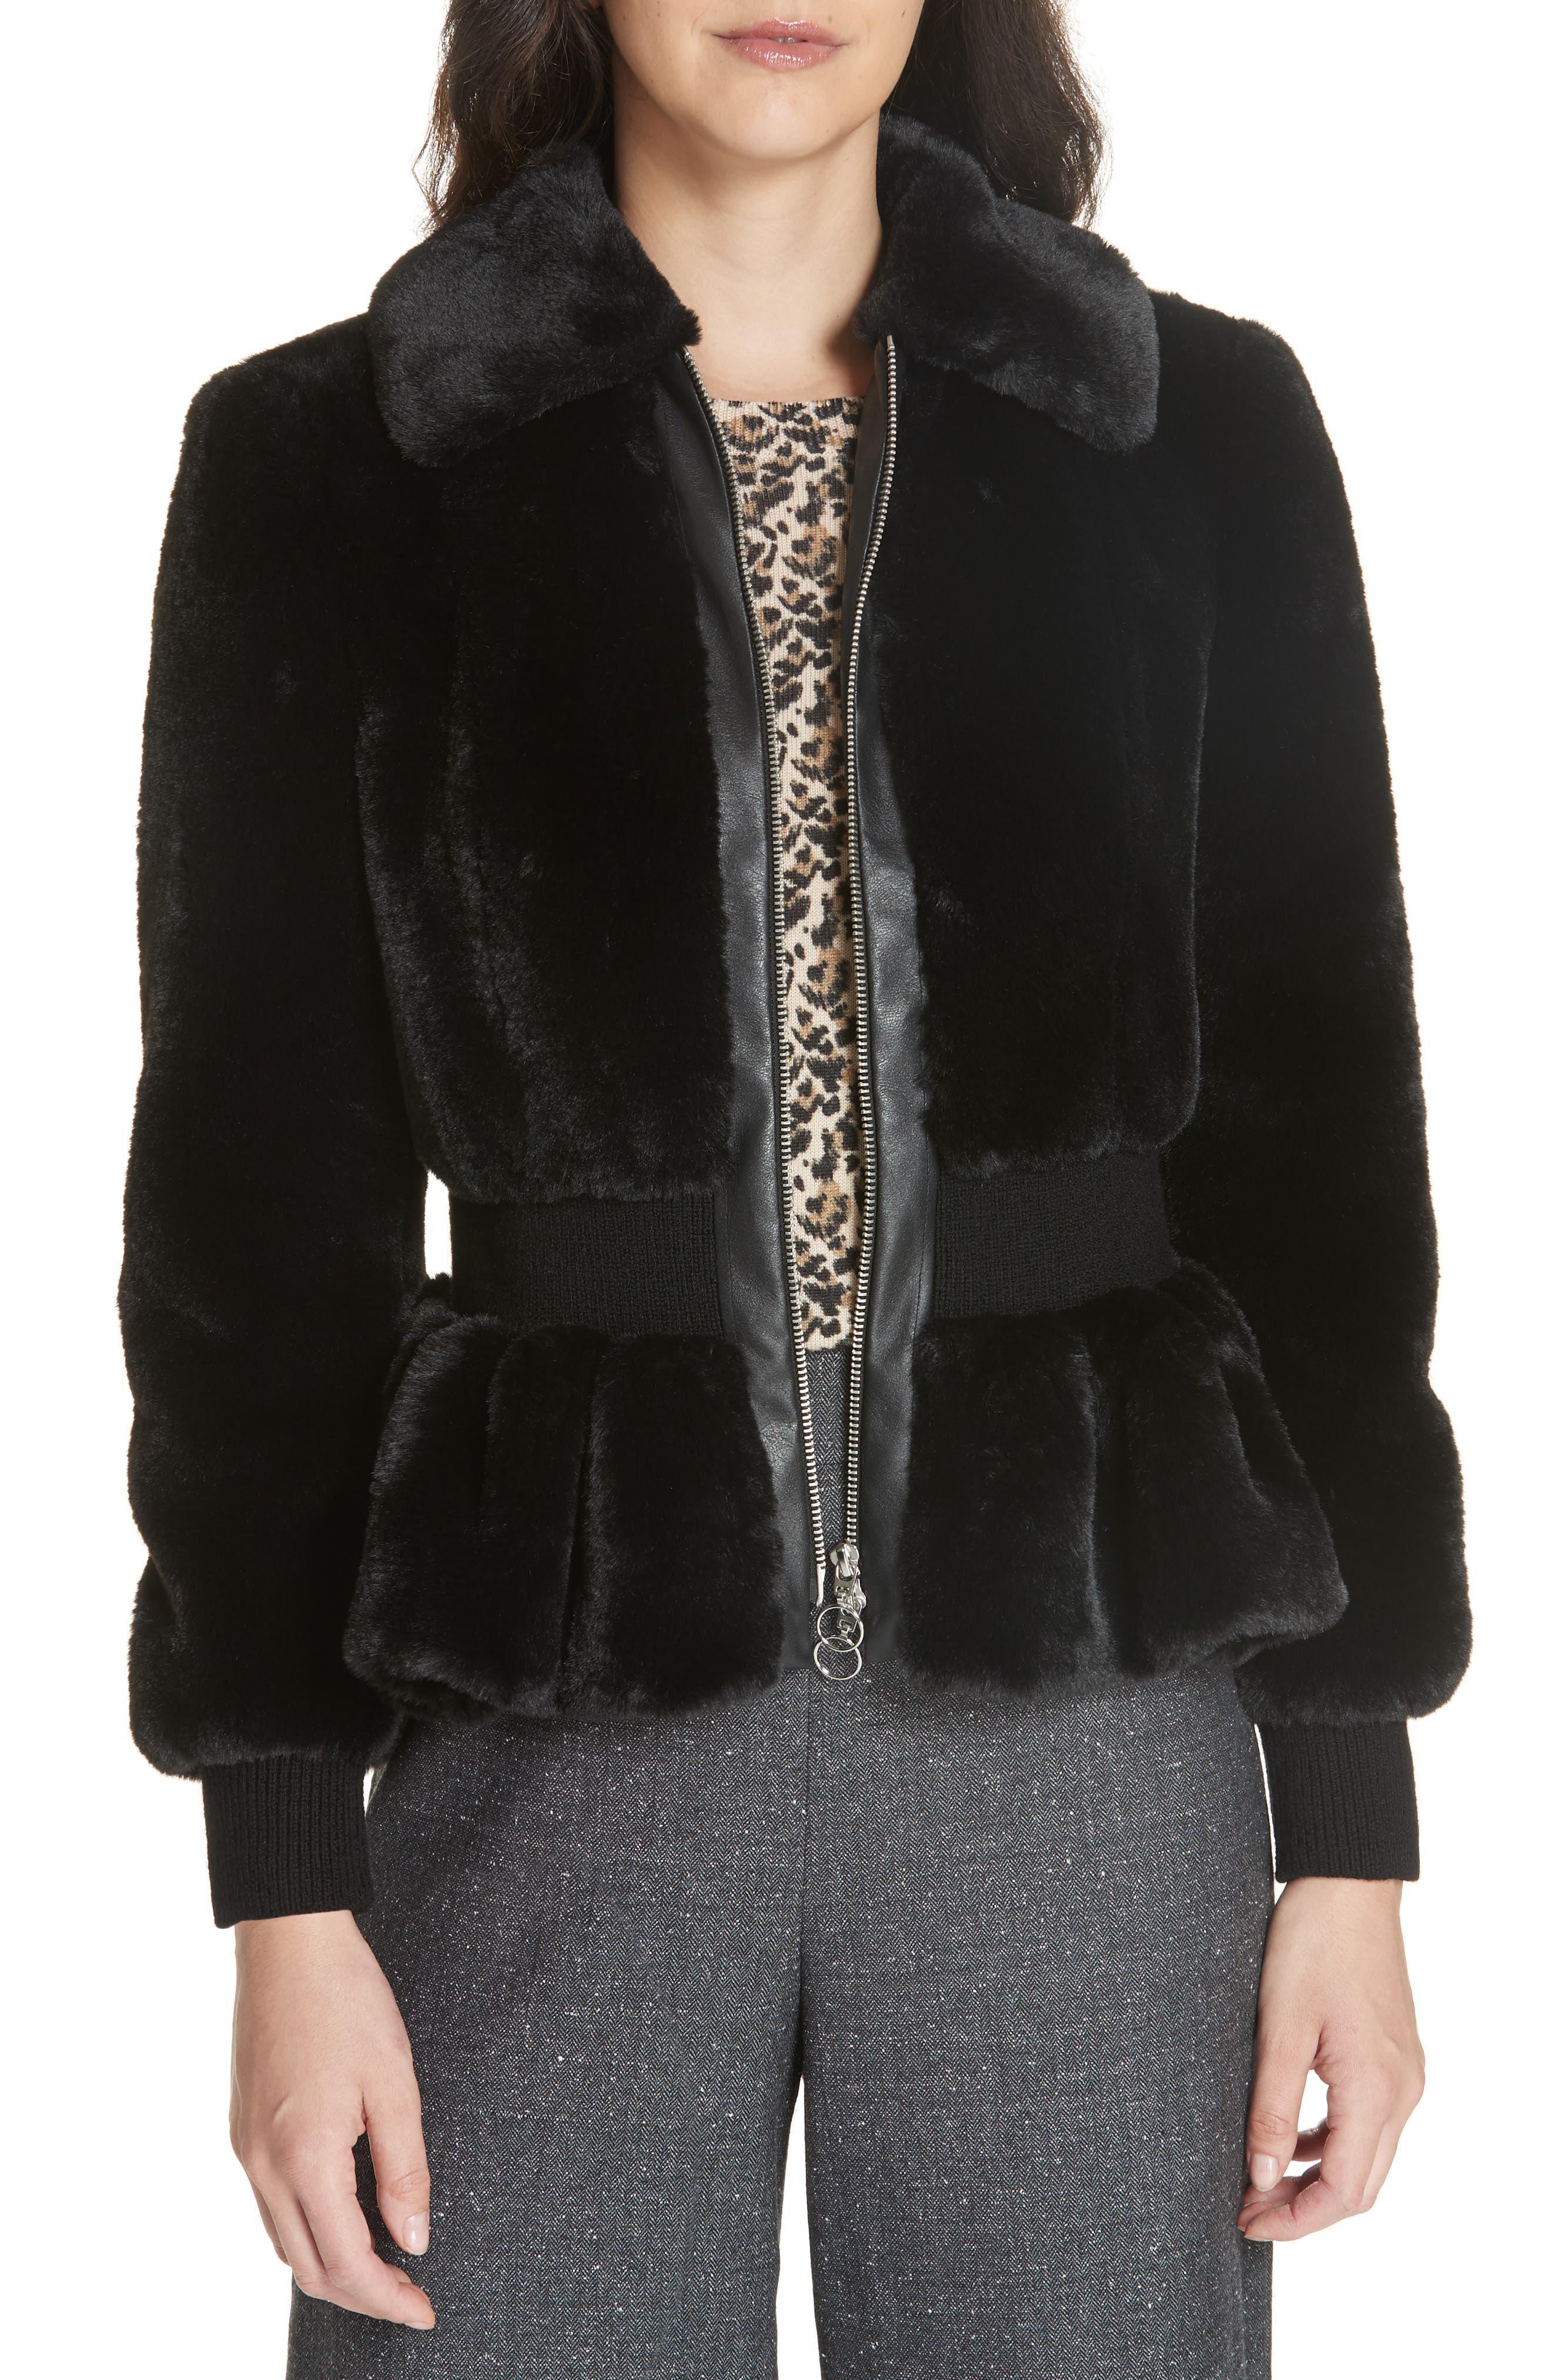 REBECCA TAYLOR Zip-Front Faux-Fur Peplum Jacket in Black